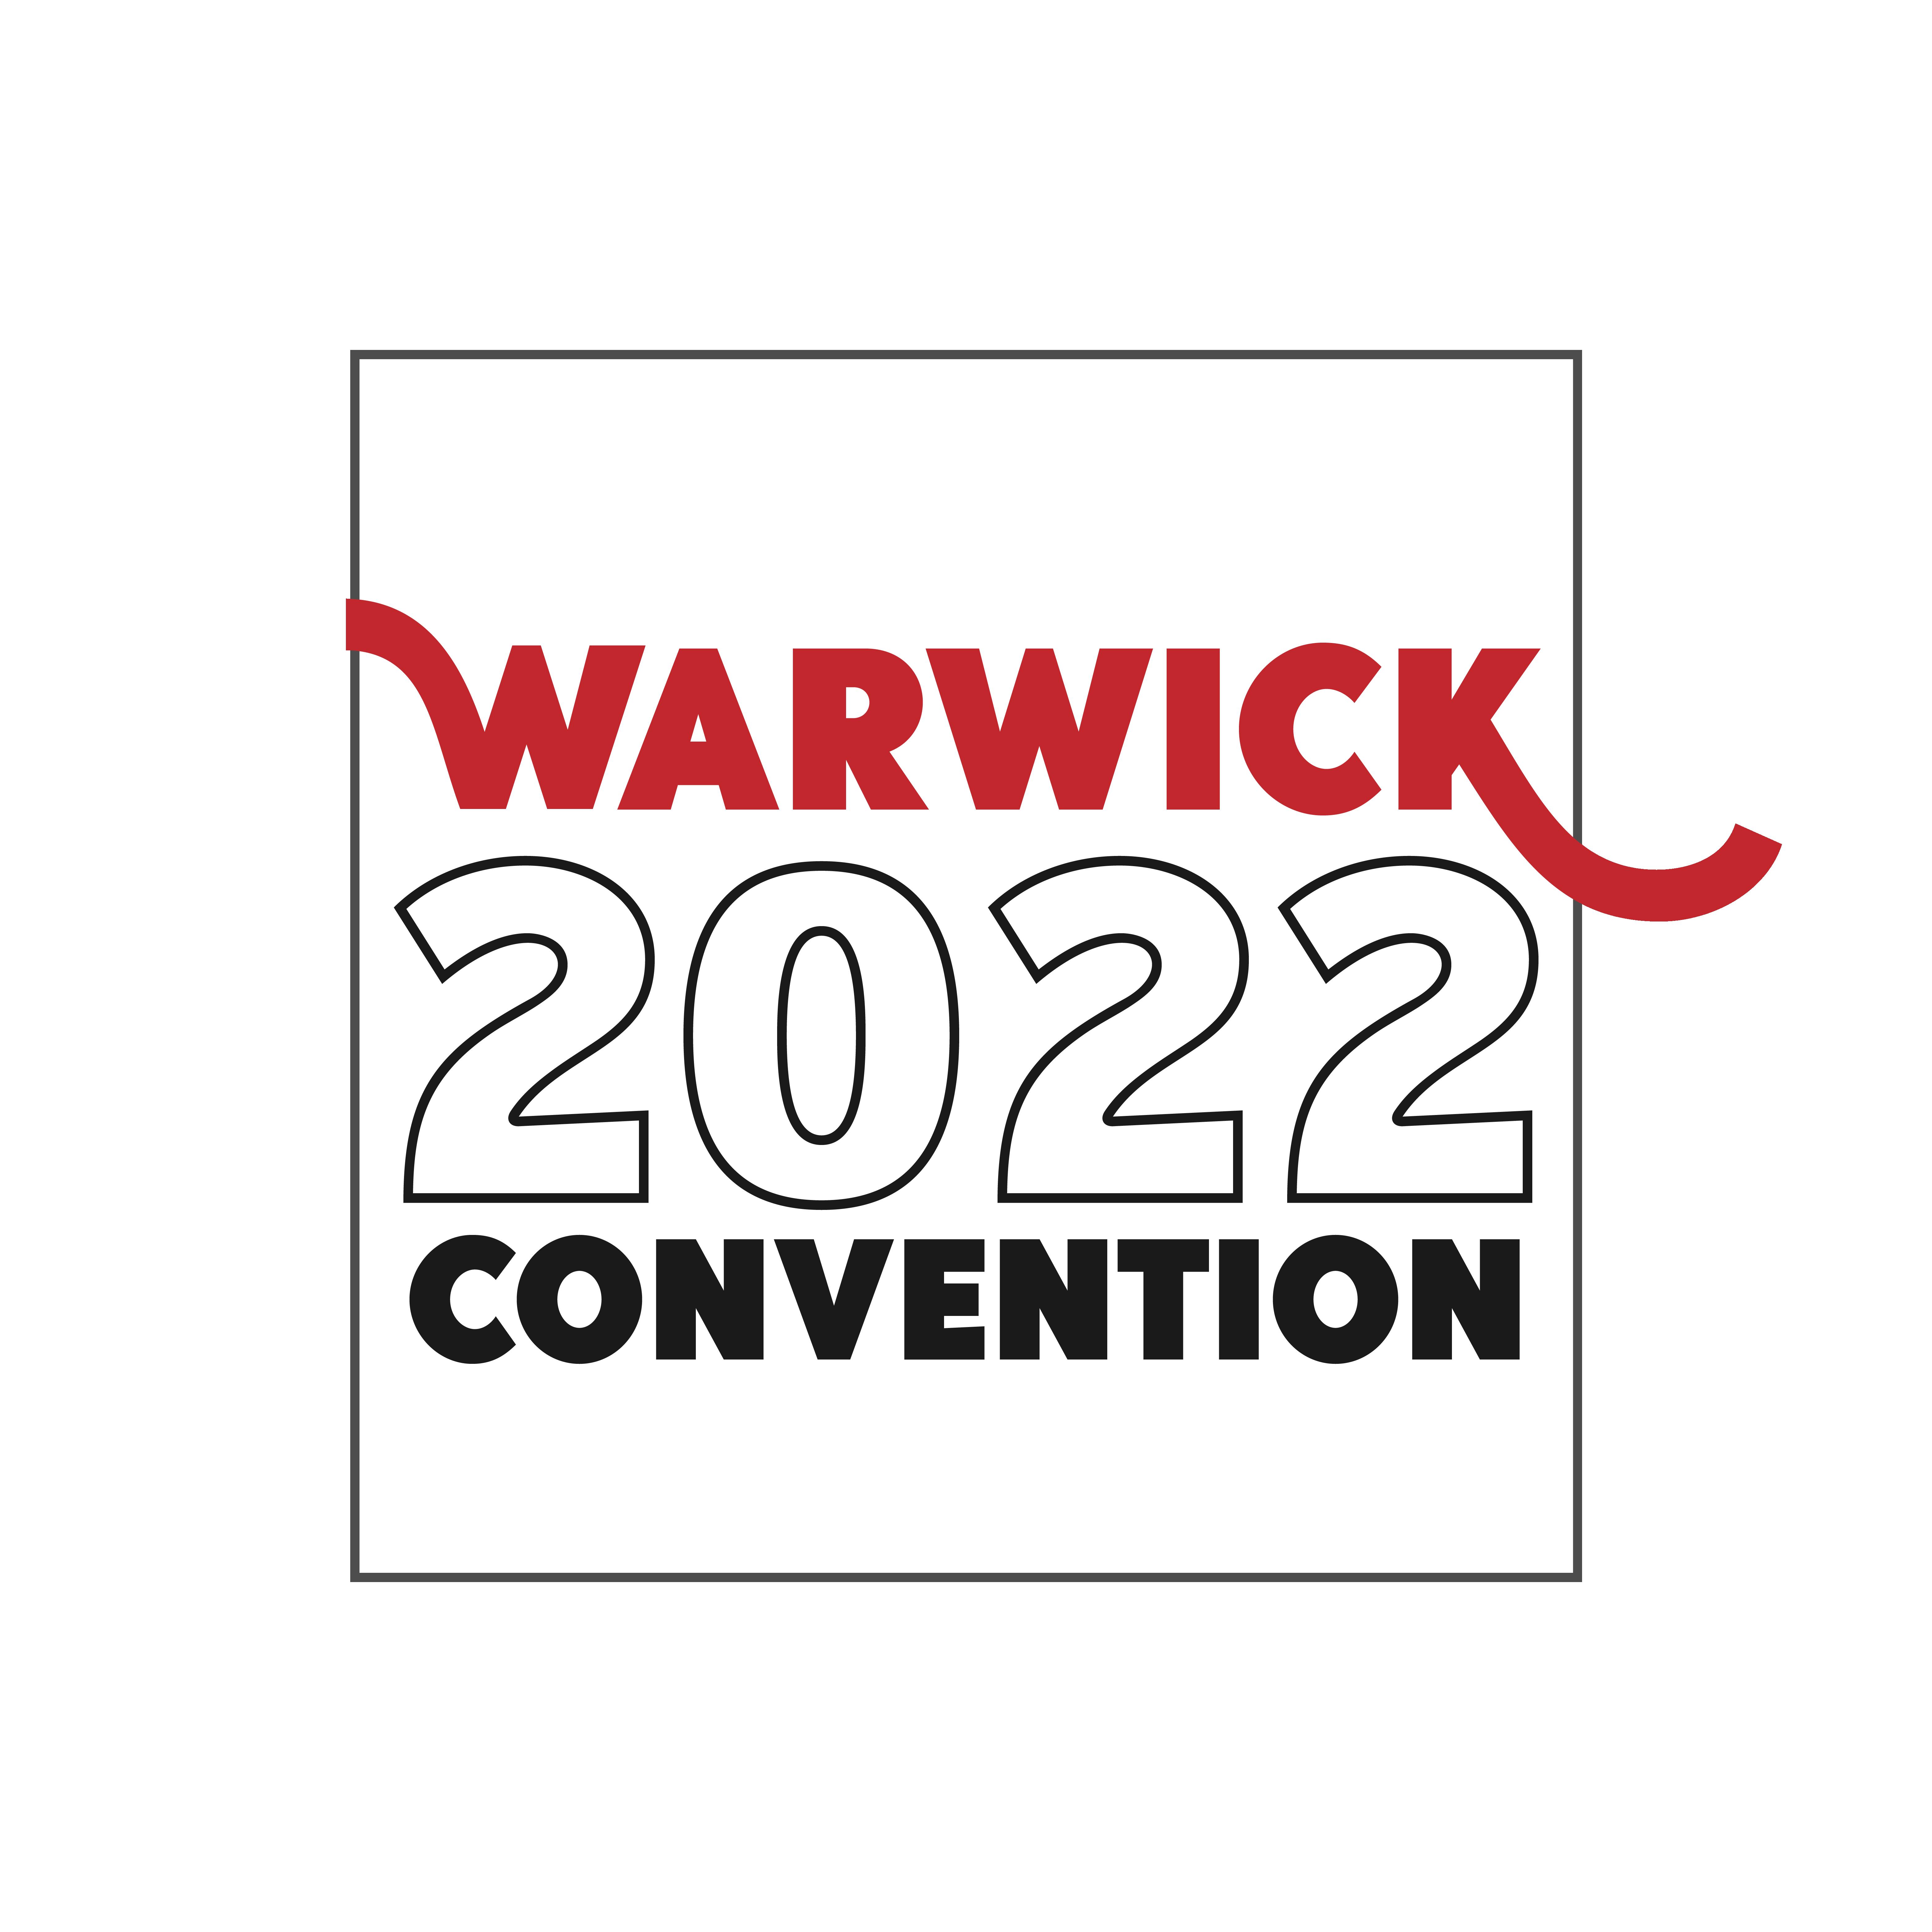 Warwick Convention 2022